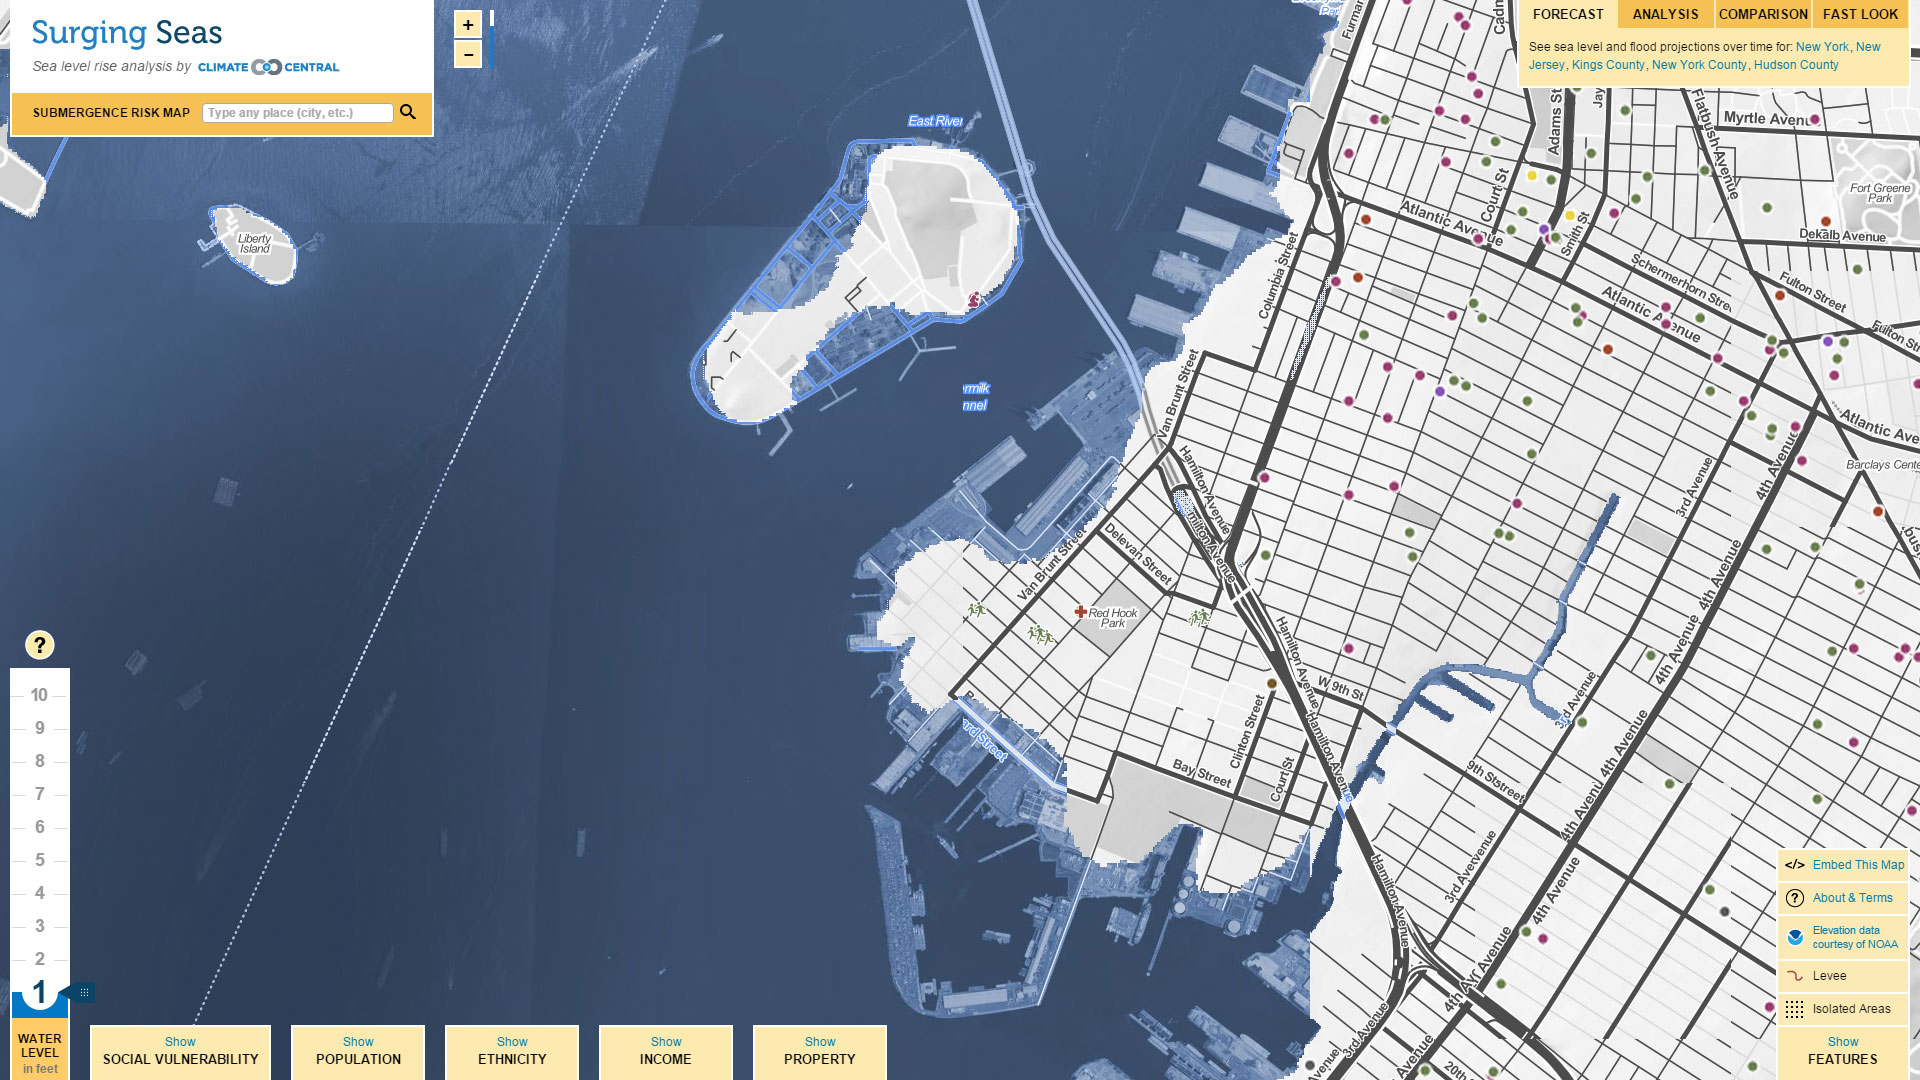 surging-seas_gov-island-red-hook_1ft